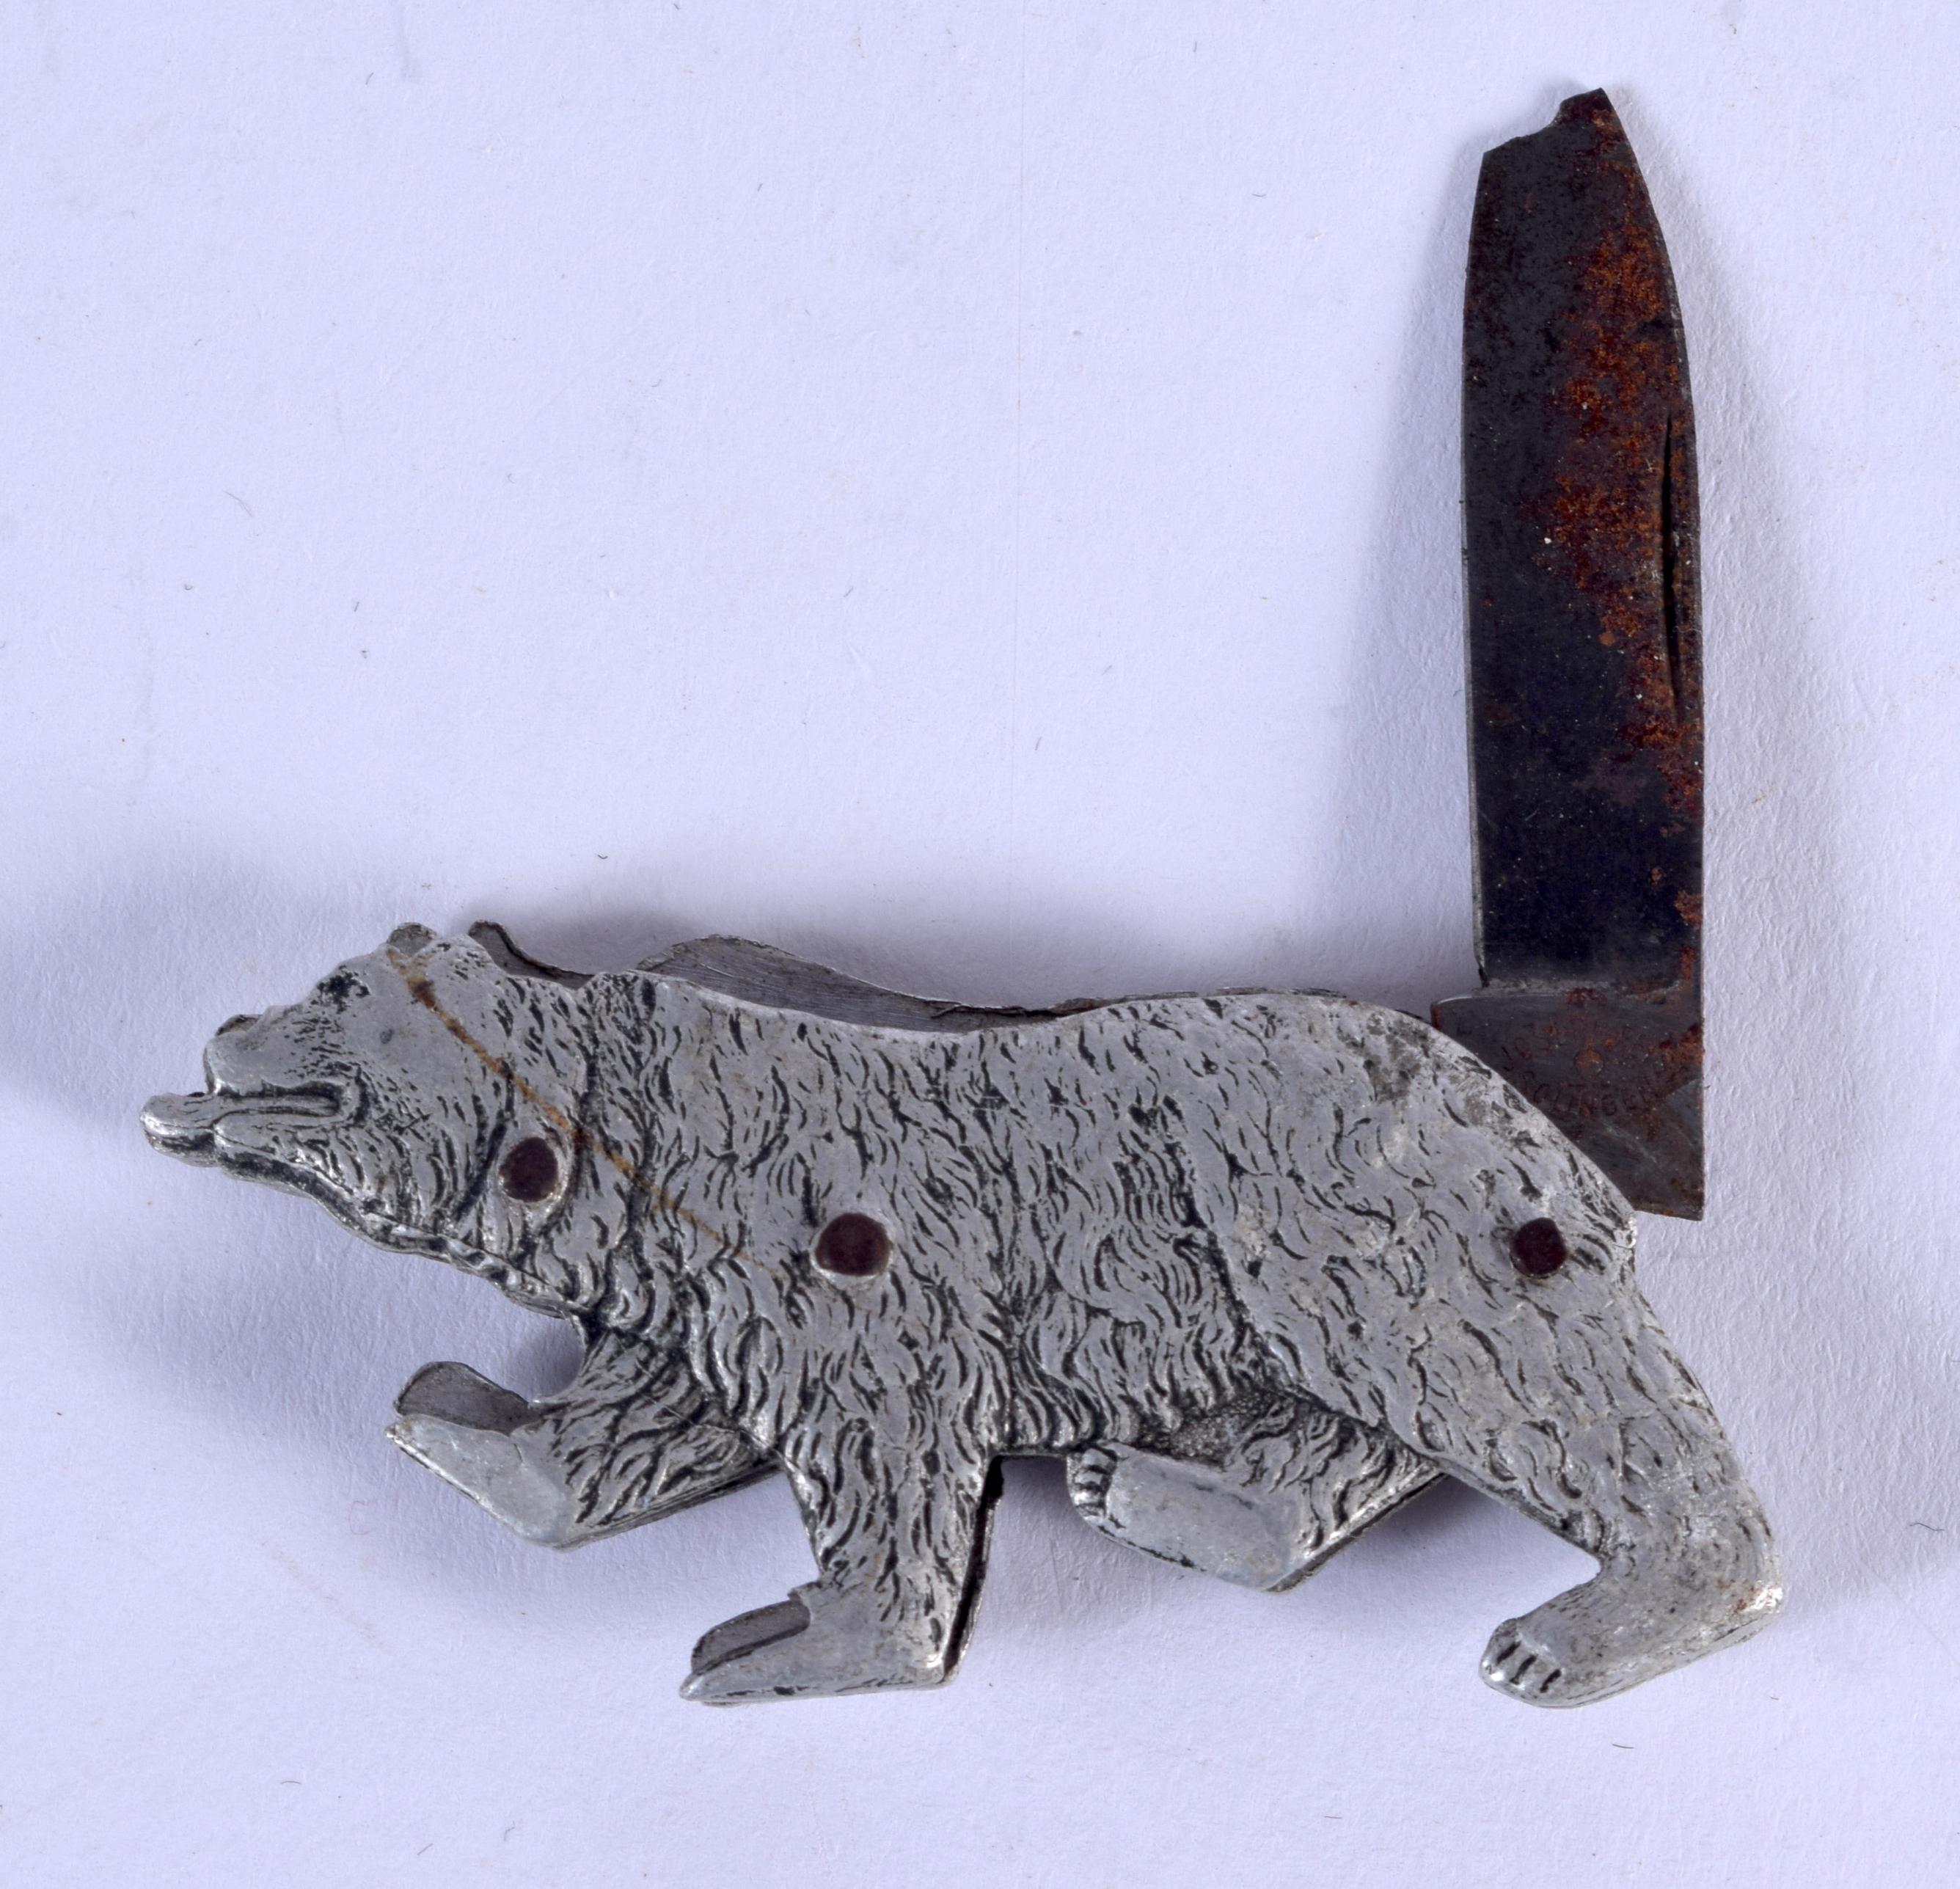 A VERY RARE 1920S ROAMING BEAR POCKET KNIFE. 5.5 cm x 3 cm. - Image 2 of 2